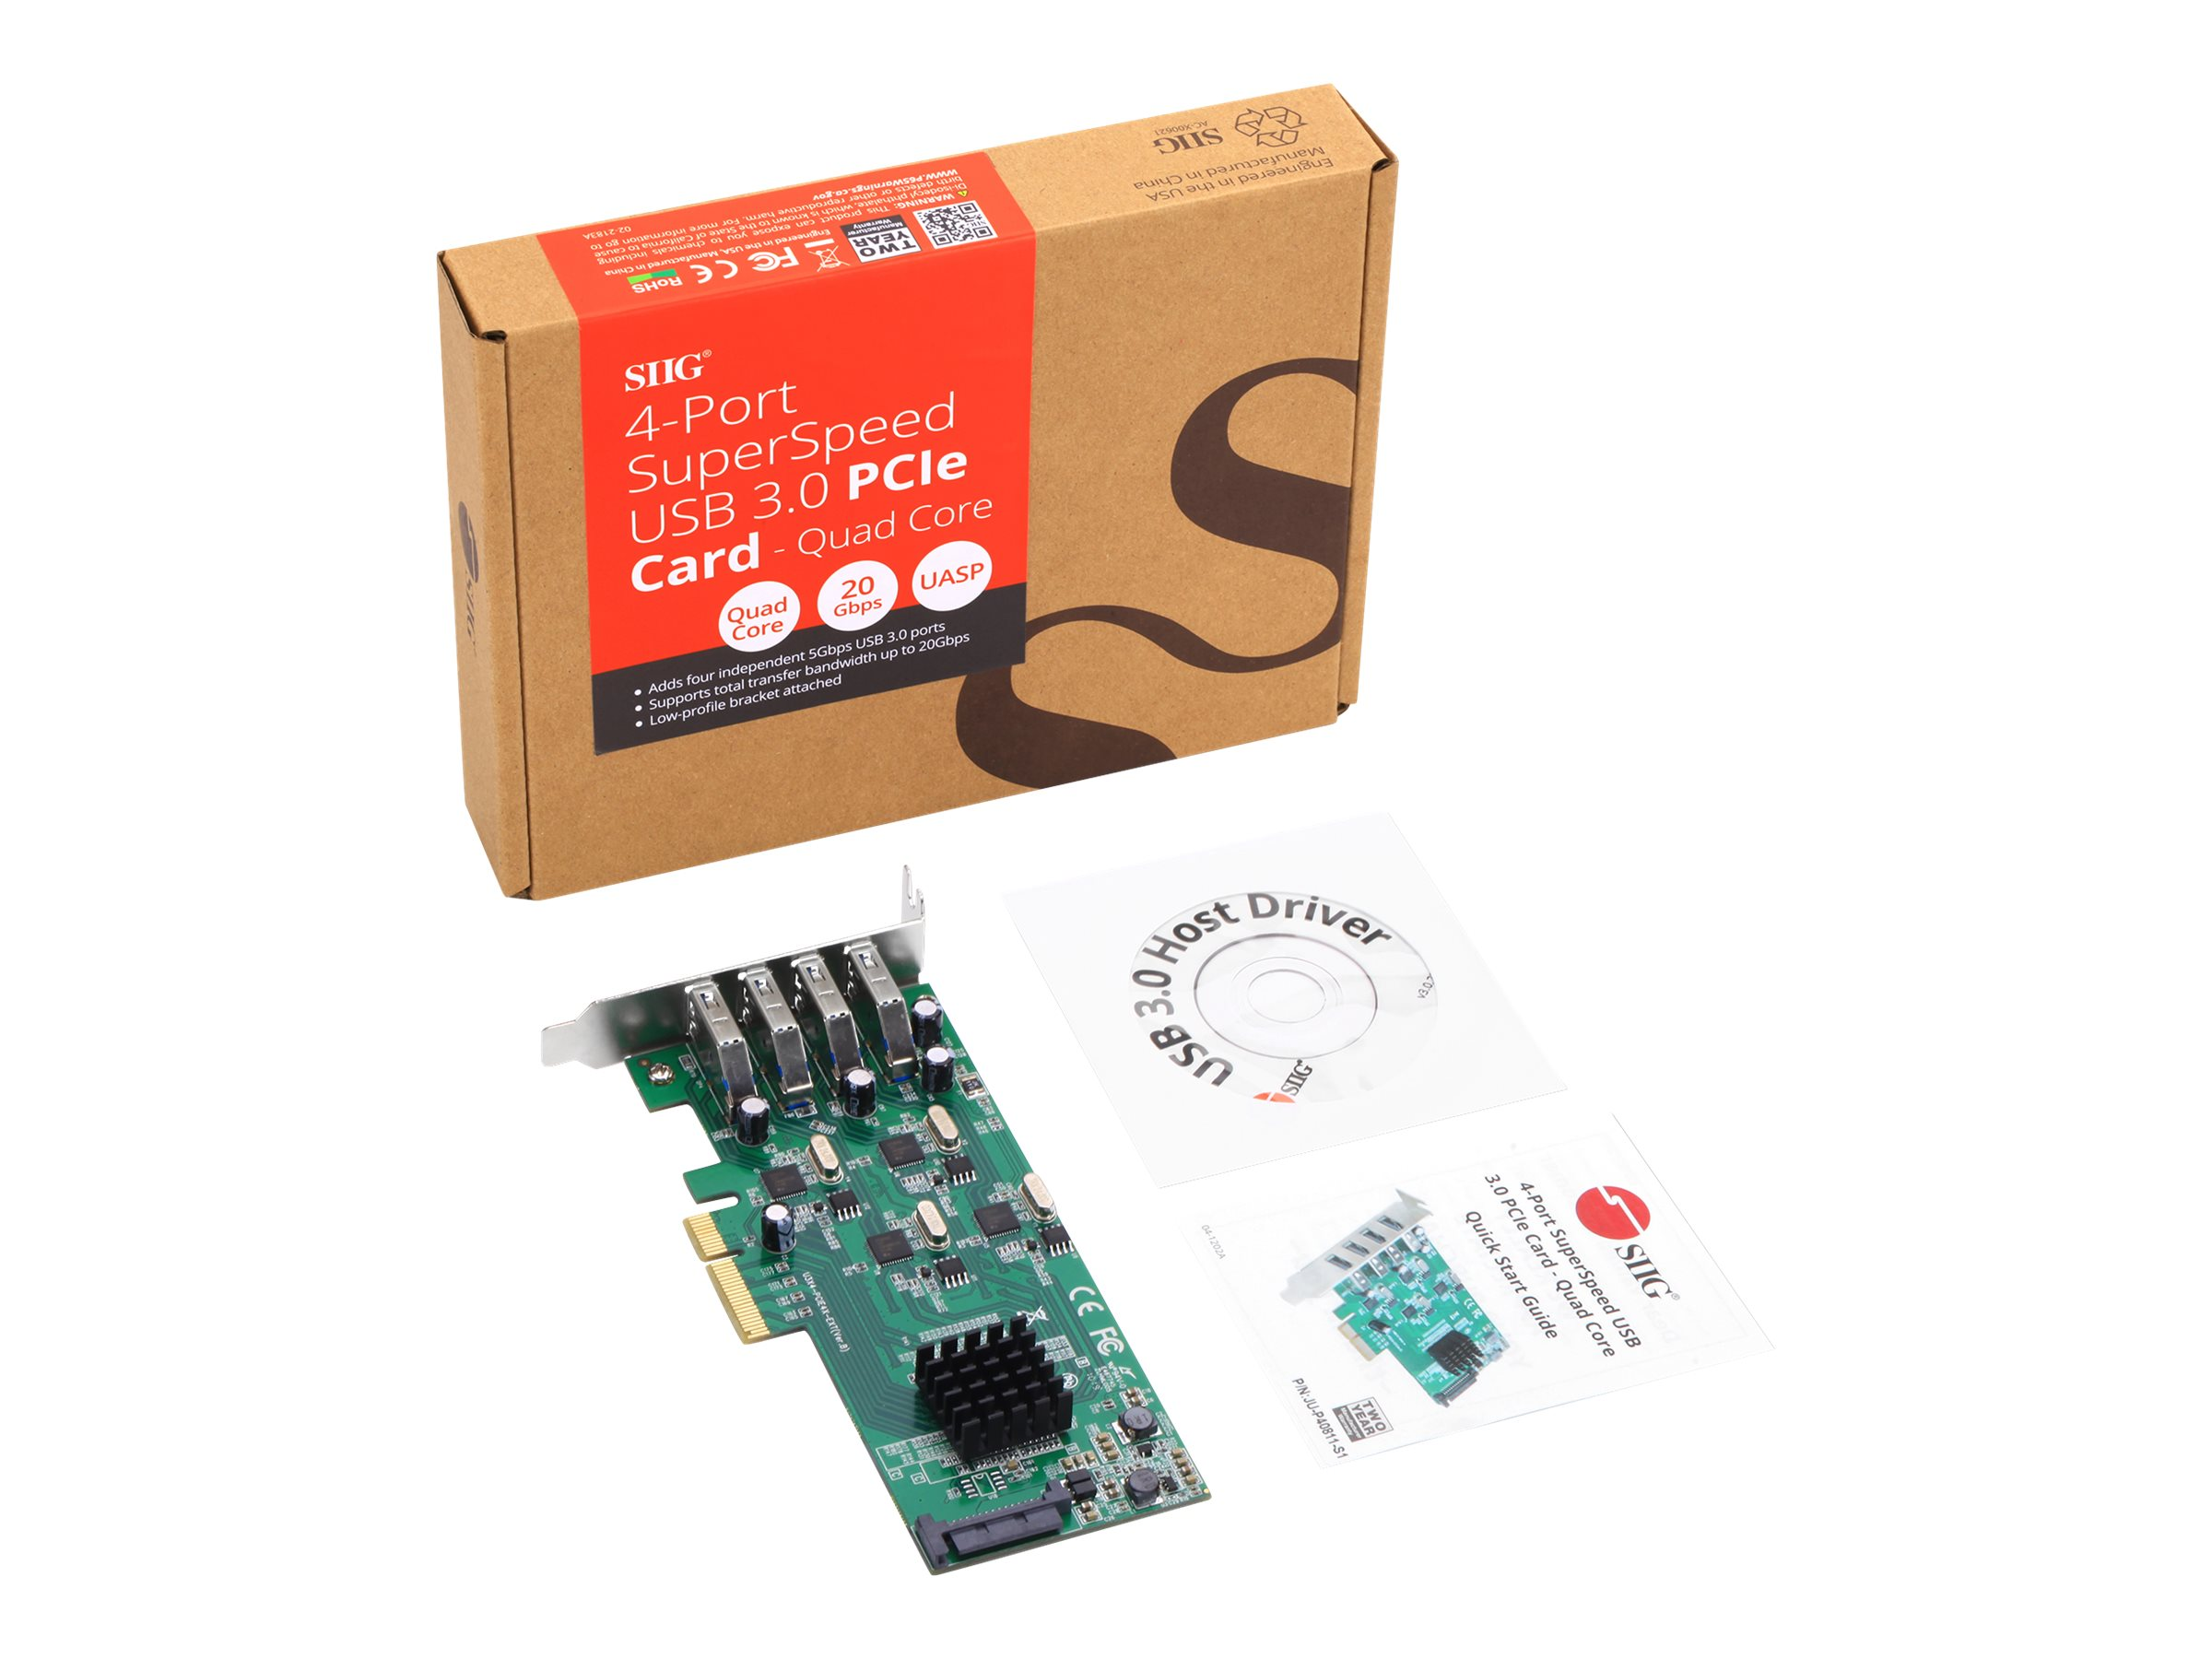 SIIG 4-Port SuperSpeed USB 3.0 PCIe Card - Quad Core - USB adapter - PCIe 2.0 x4 - USB 3.0 x 4